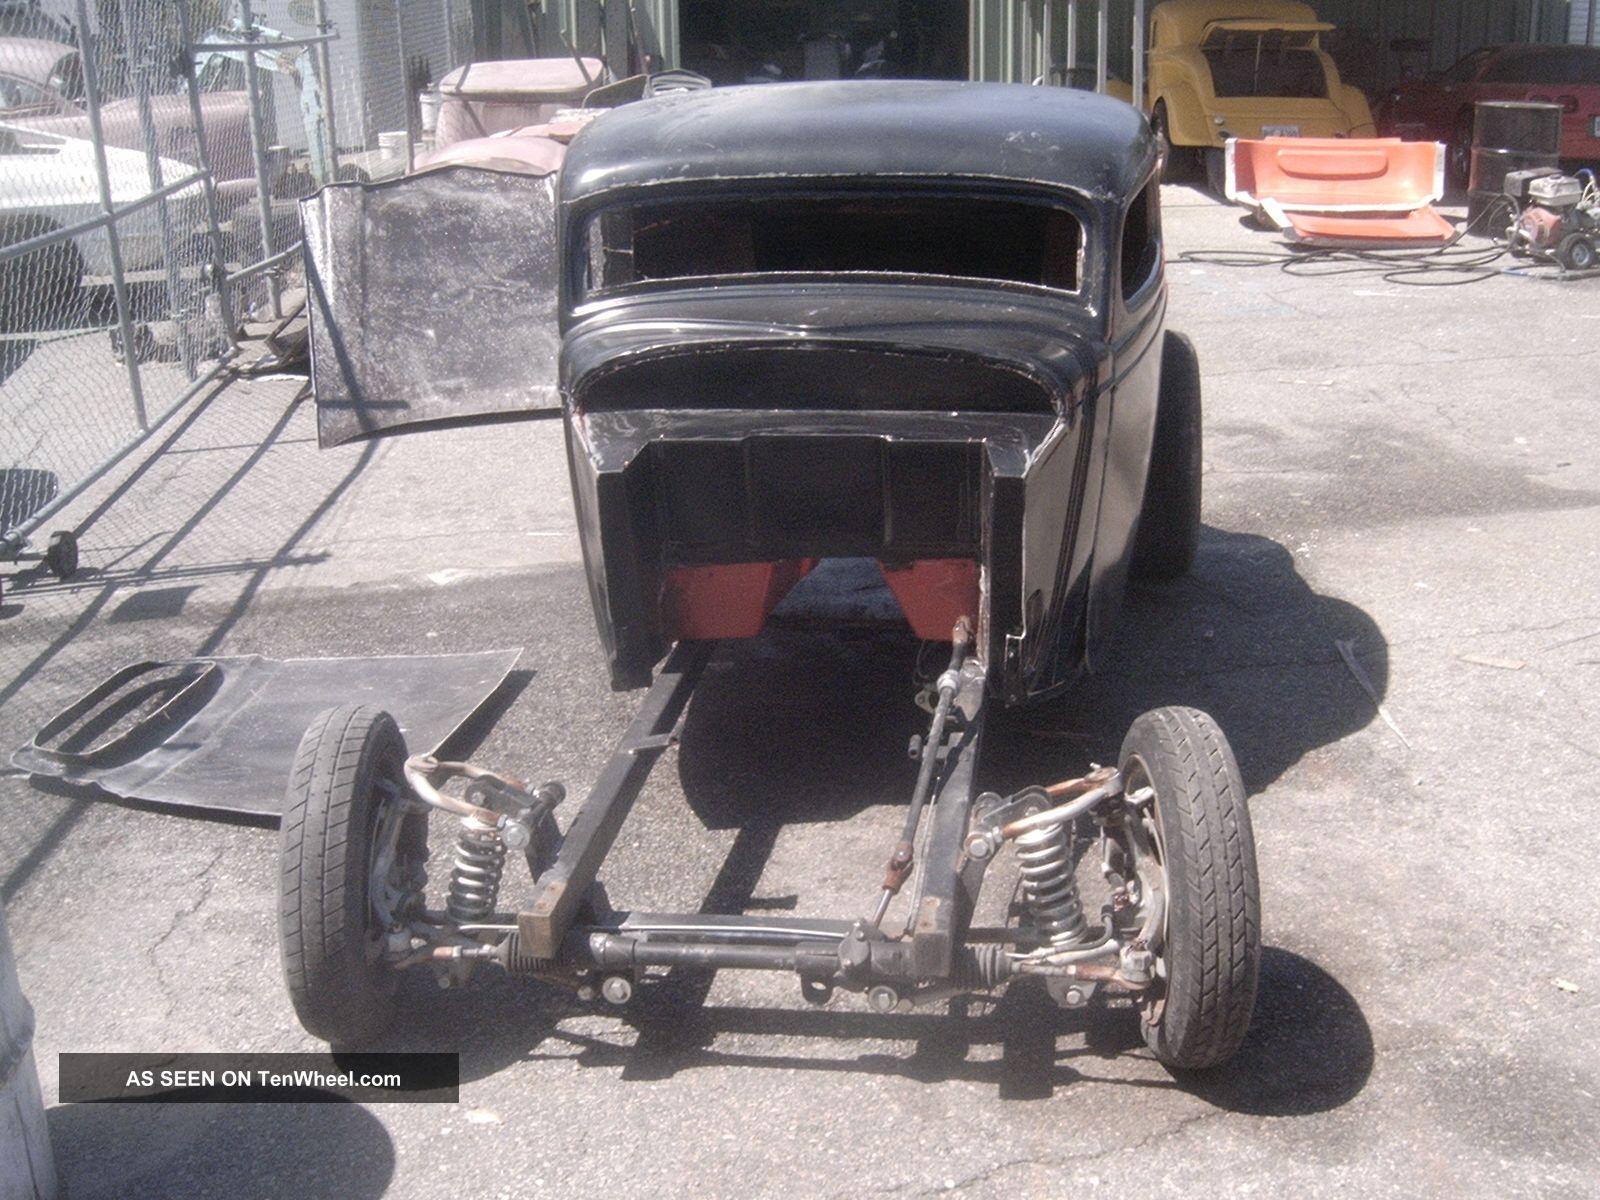 1934 Ford Coupe Roller Fiberglass Body Bycorbinrods Replica/Kit Makes photo